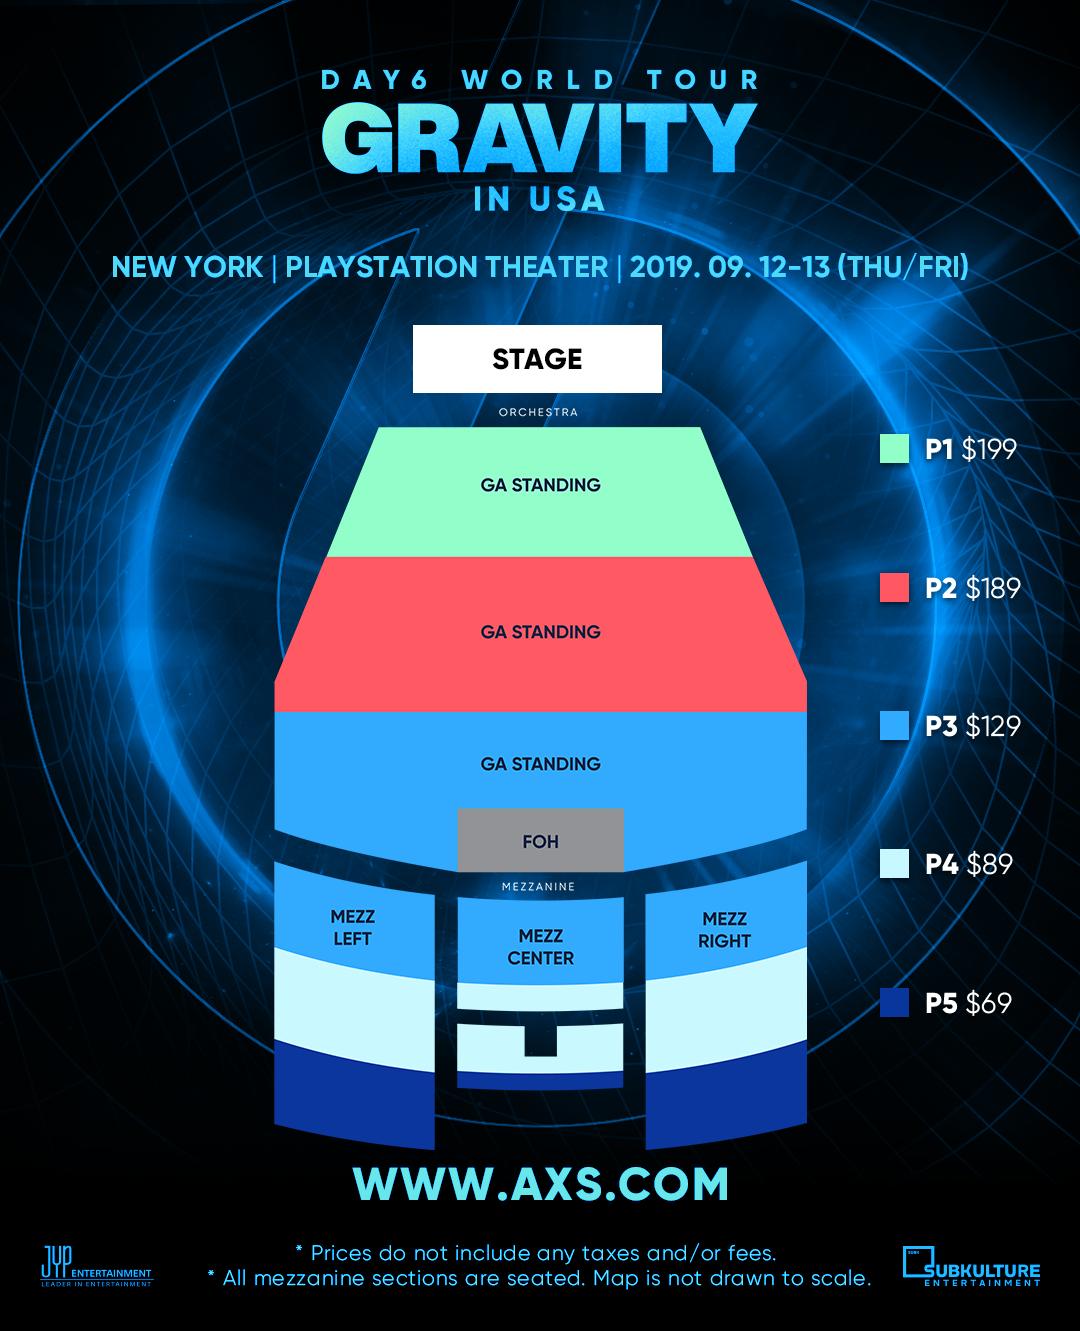 Day6 World Tour Gravity In Usa Subkulture Entertainment